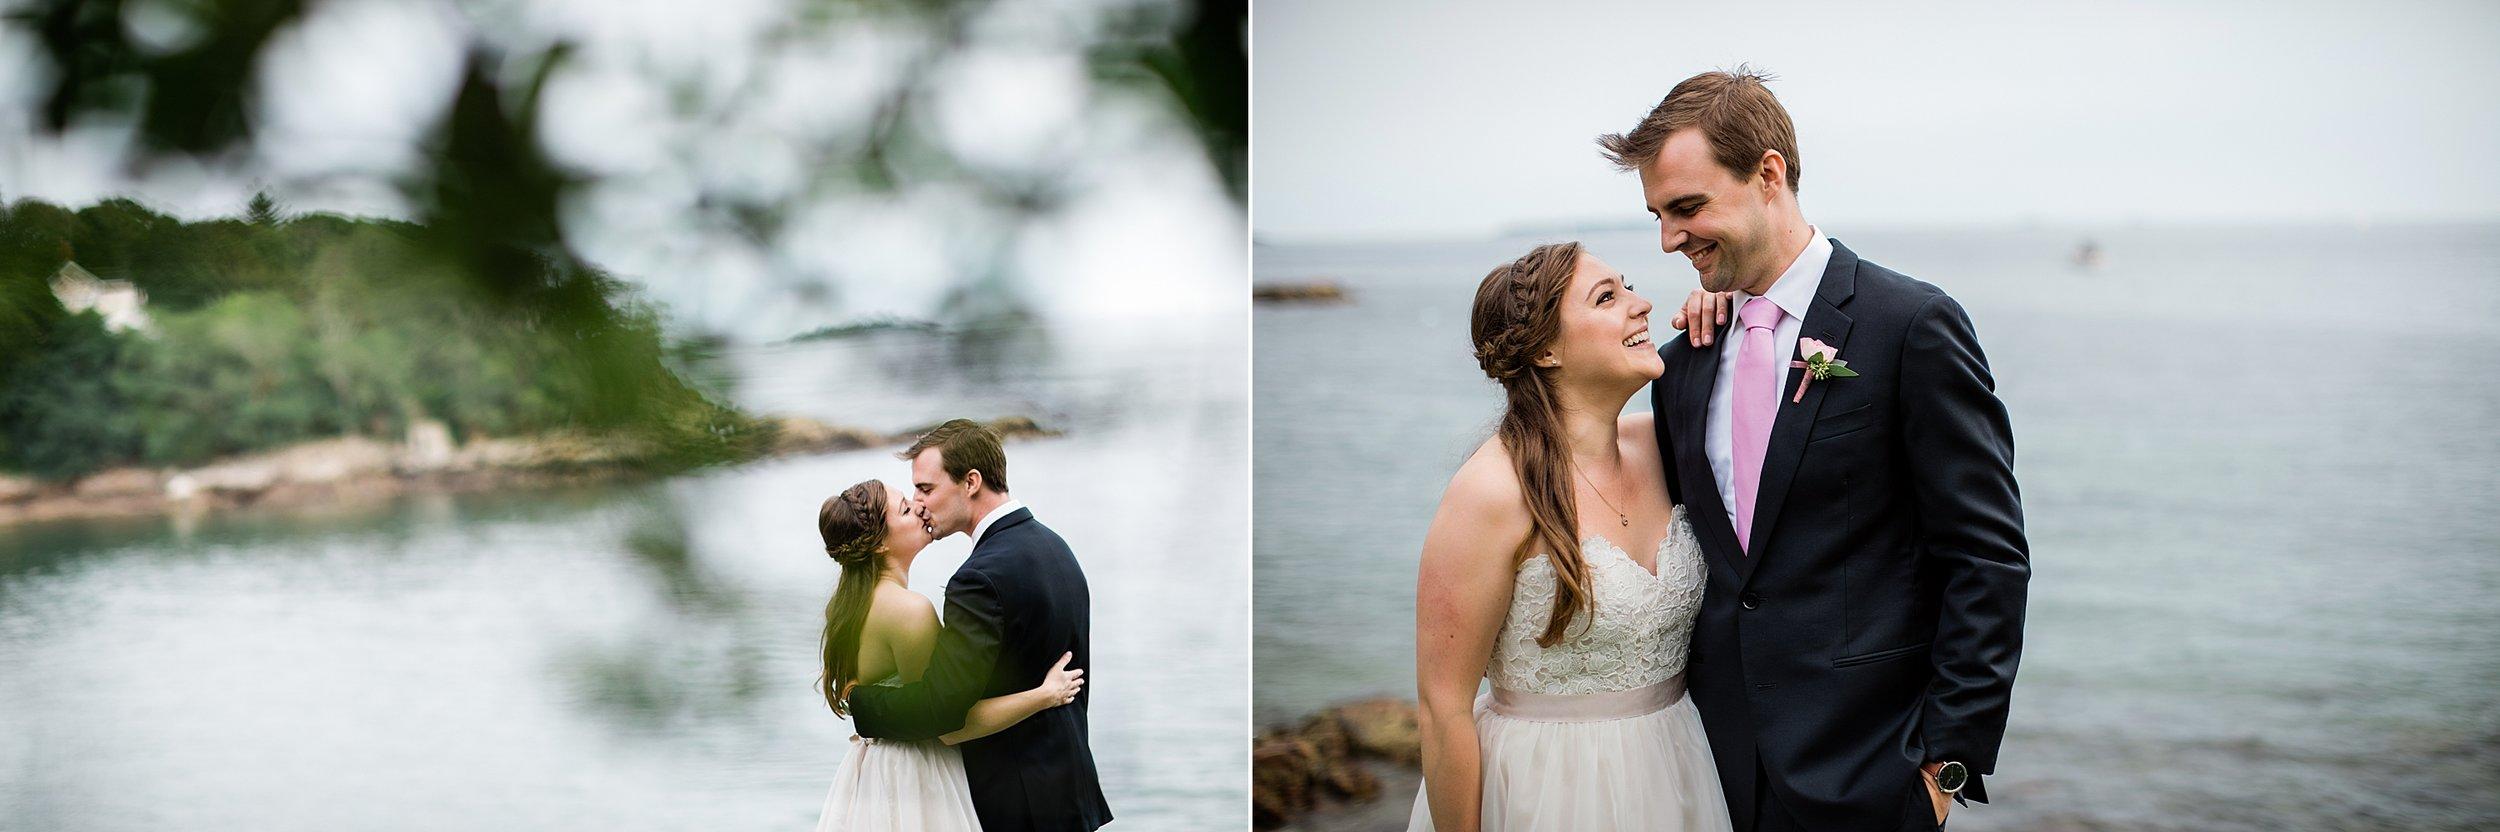 014 los angeles wedding photographer todd danforth photography boston.jpg